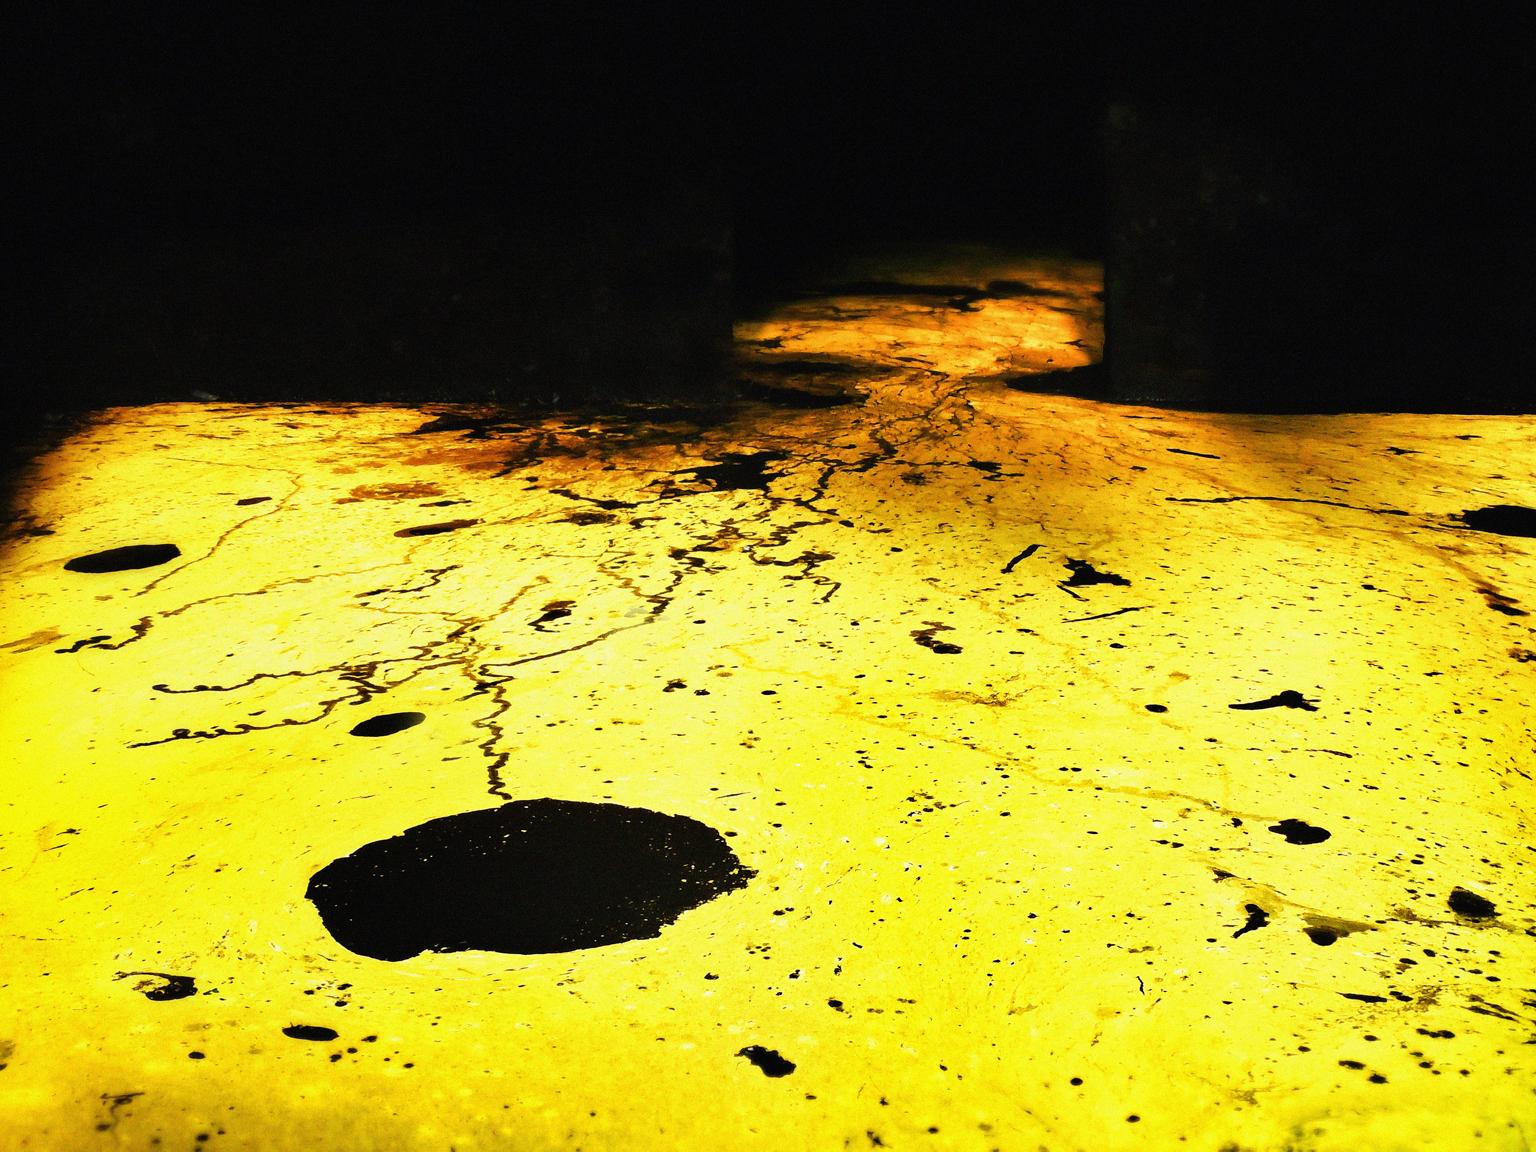 Flooded Etruscan tomb in Cerveteri